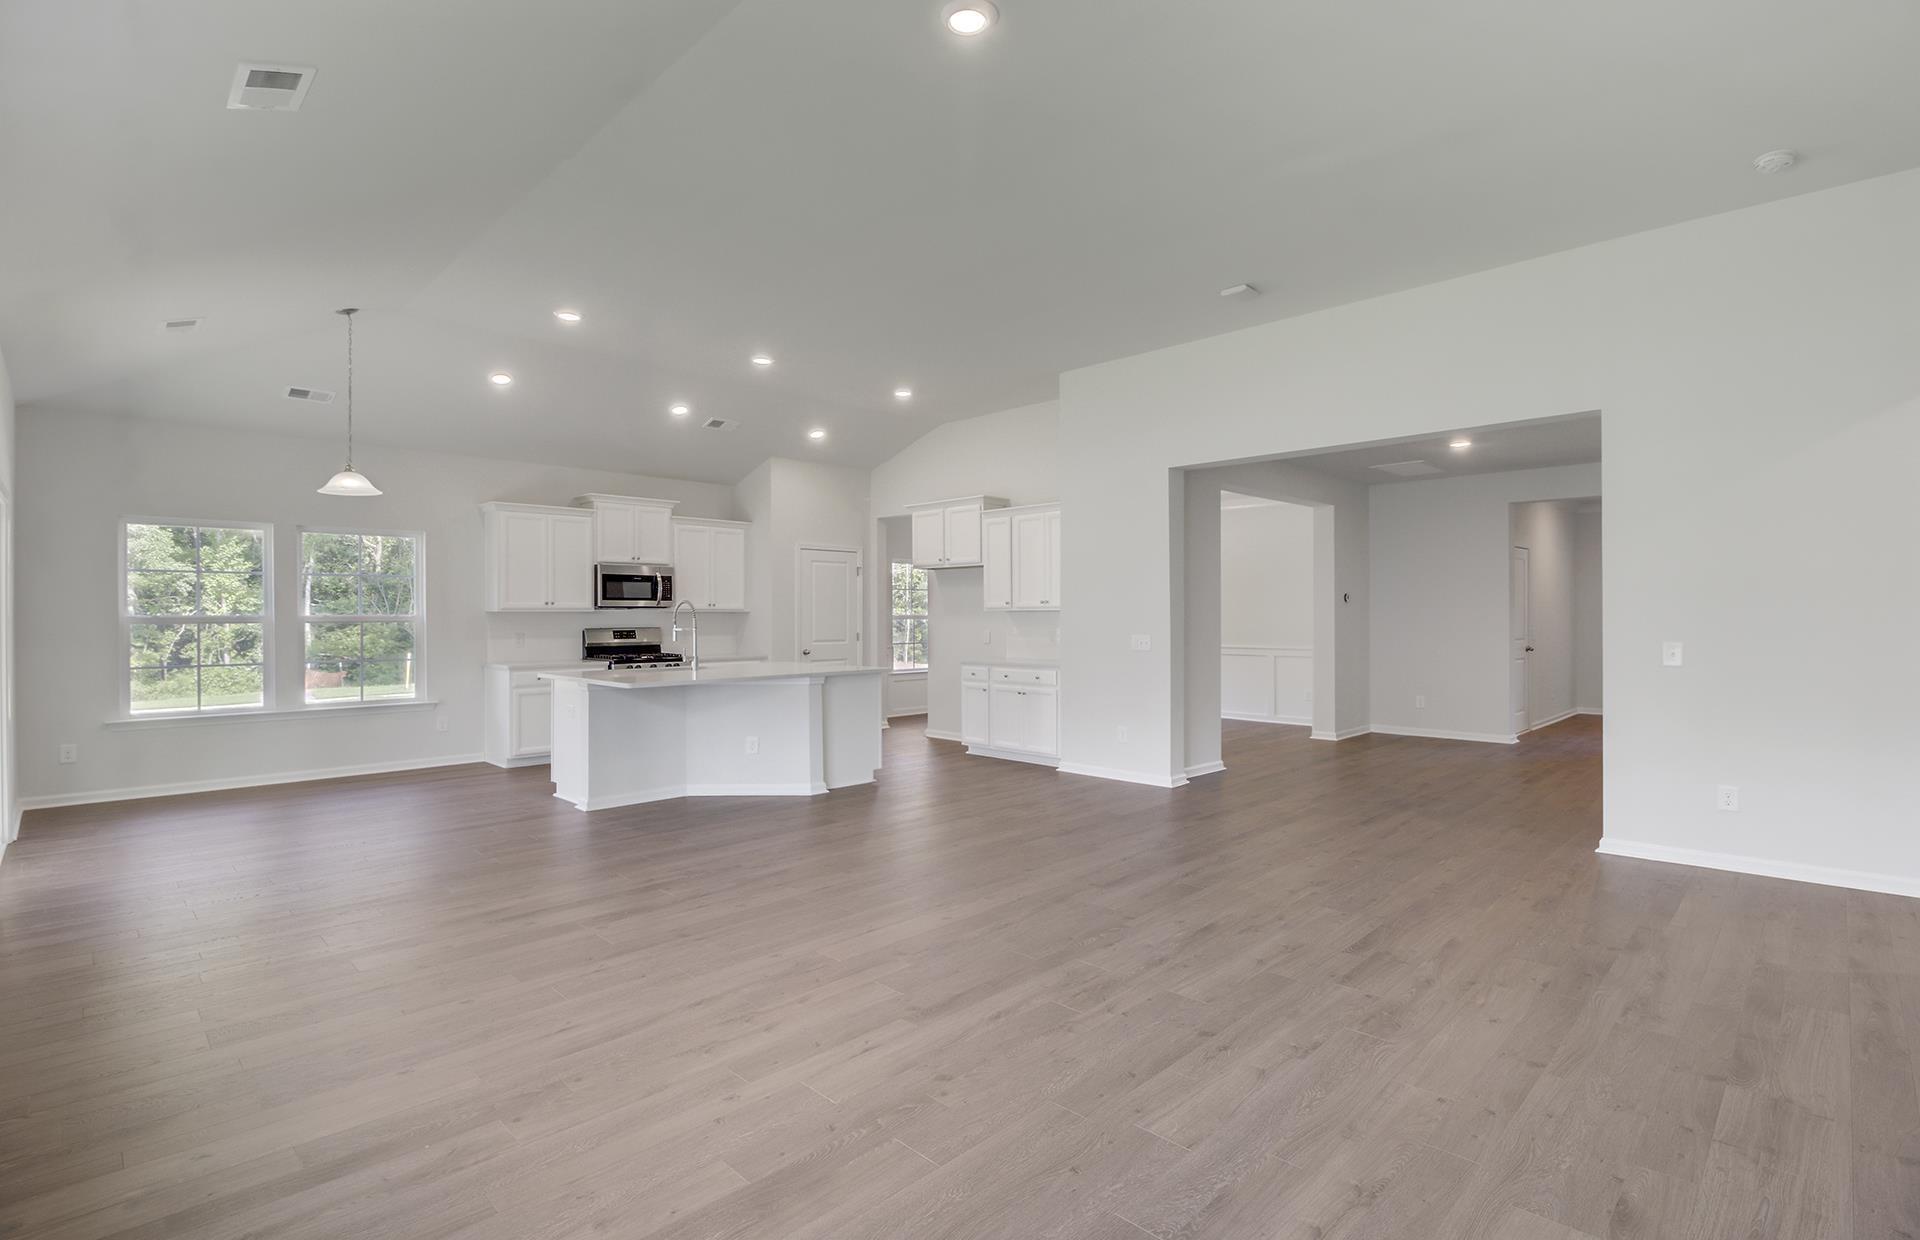 Cane Bay Plantation Homes For Sale - 205 Granton Edge, Summerville, SC - 2